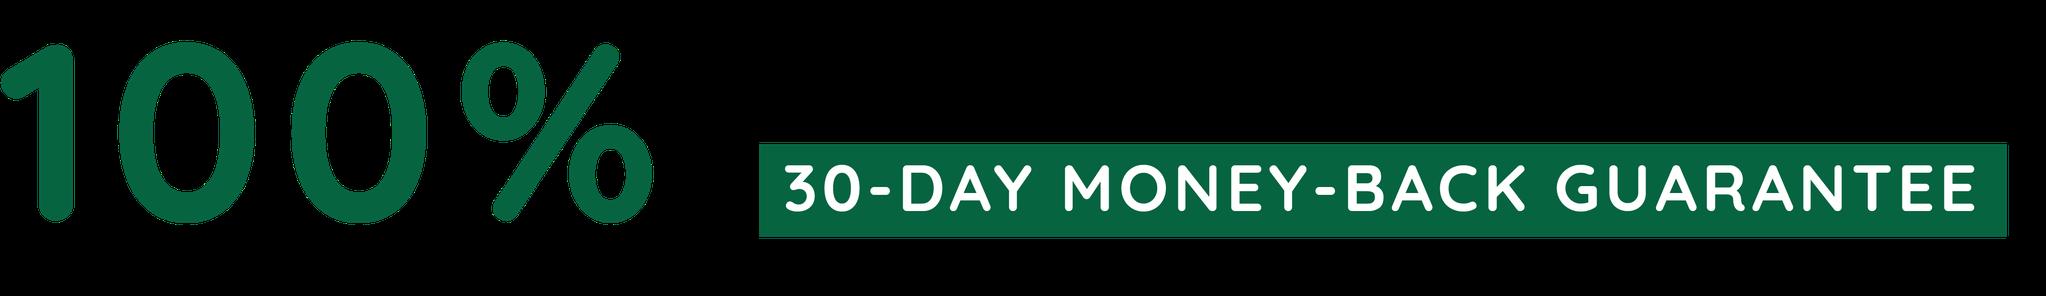 100% Satisfaction 30-Day Money-back Guarantee